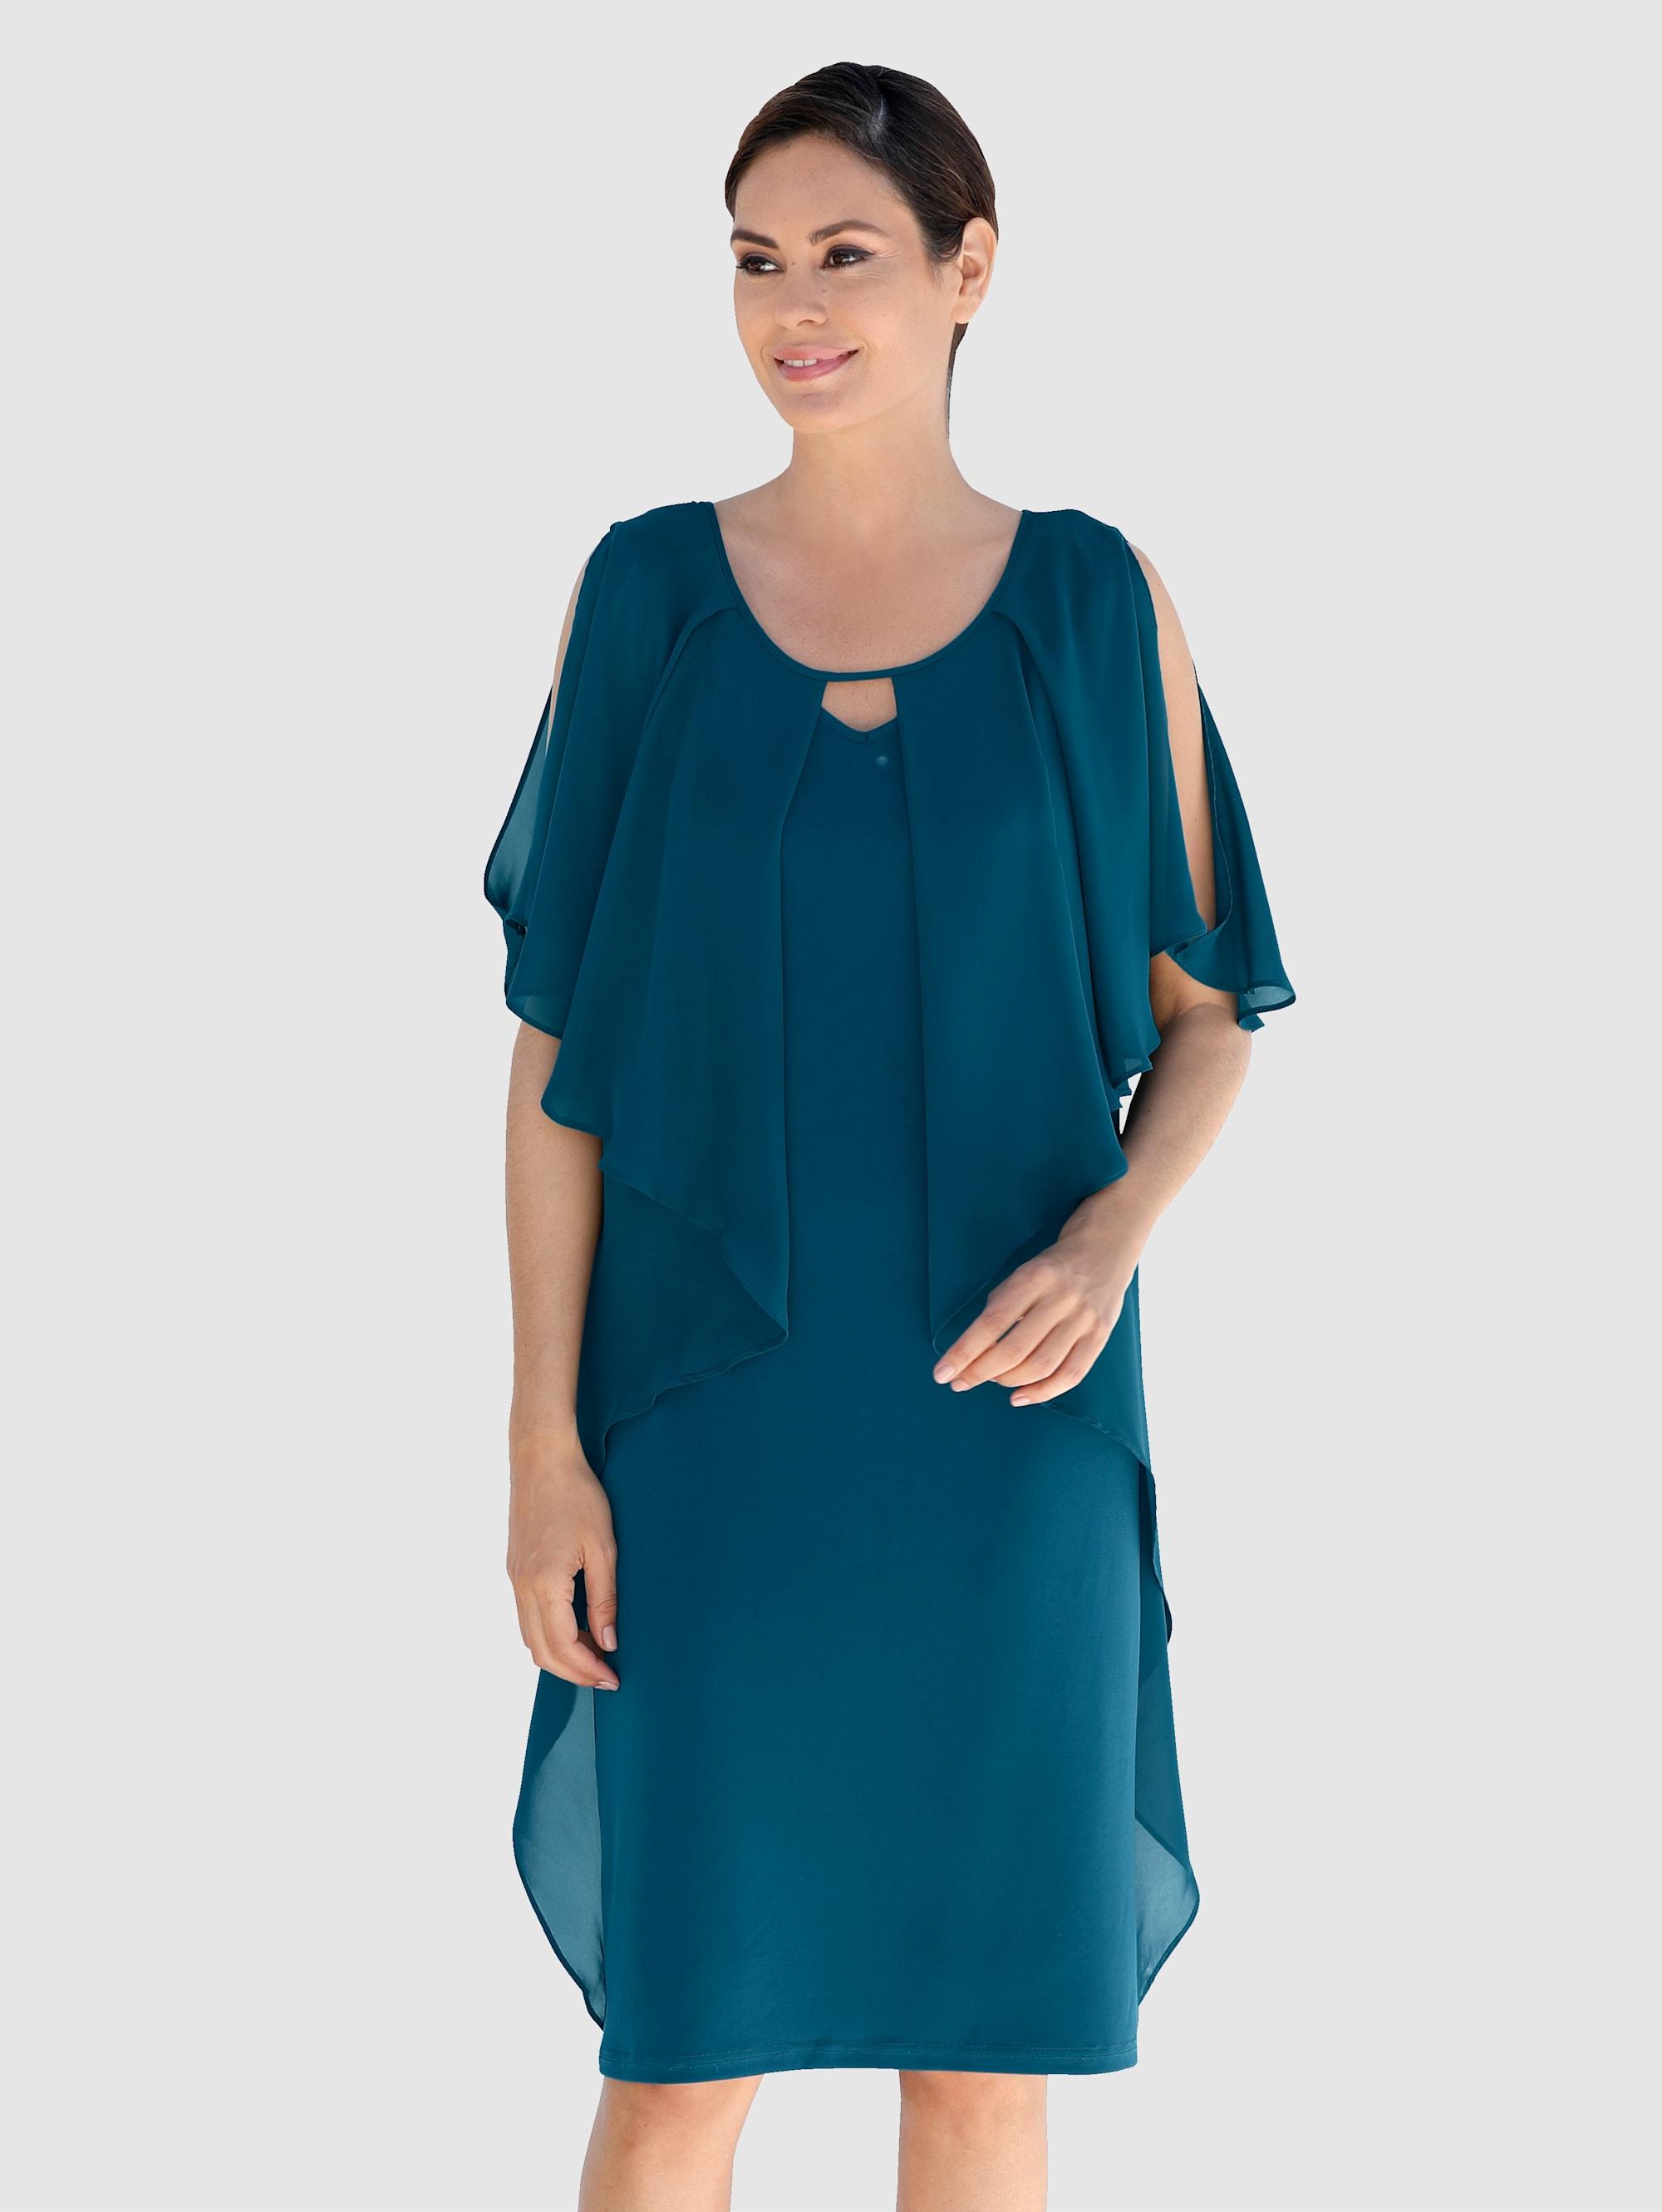 KLiNGEL Kleid in Petrol günstig kaufen